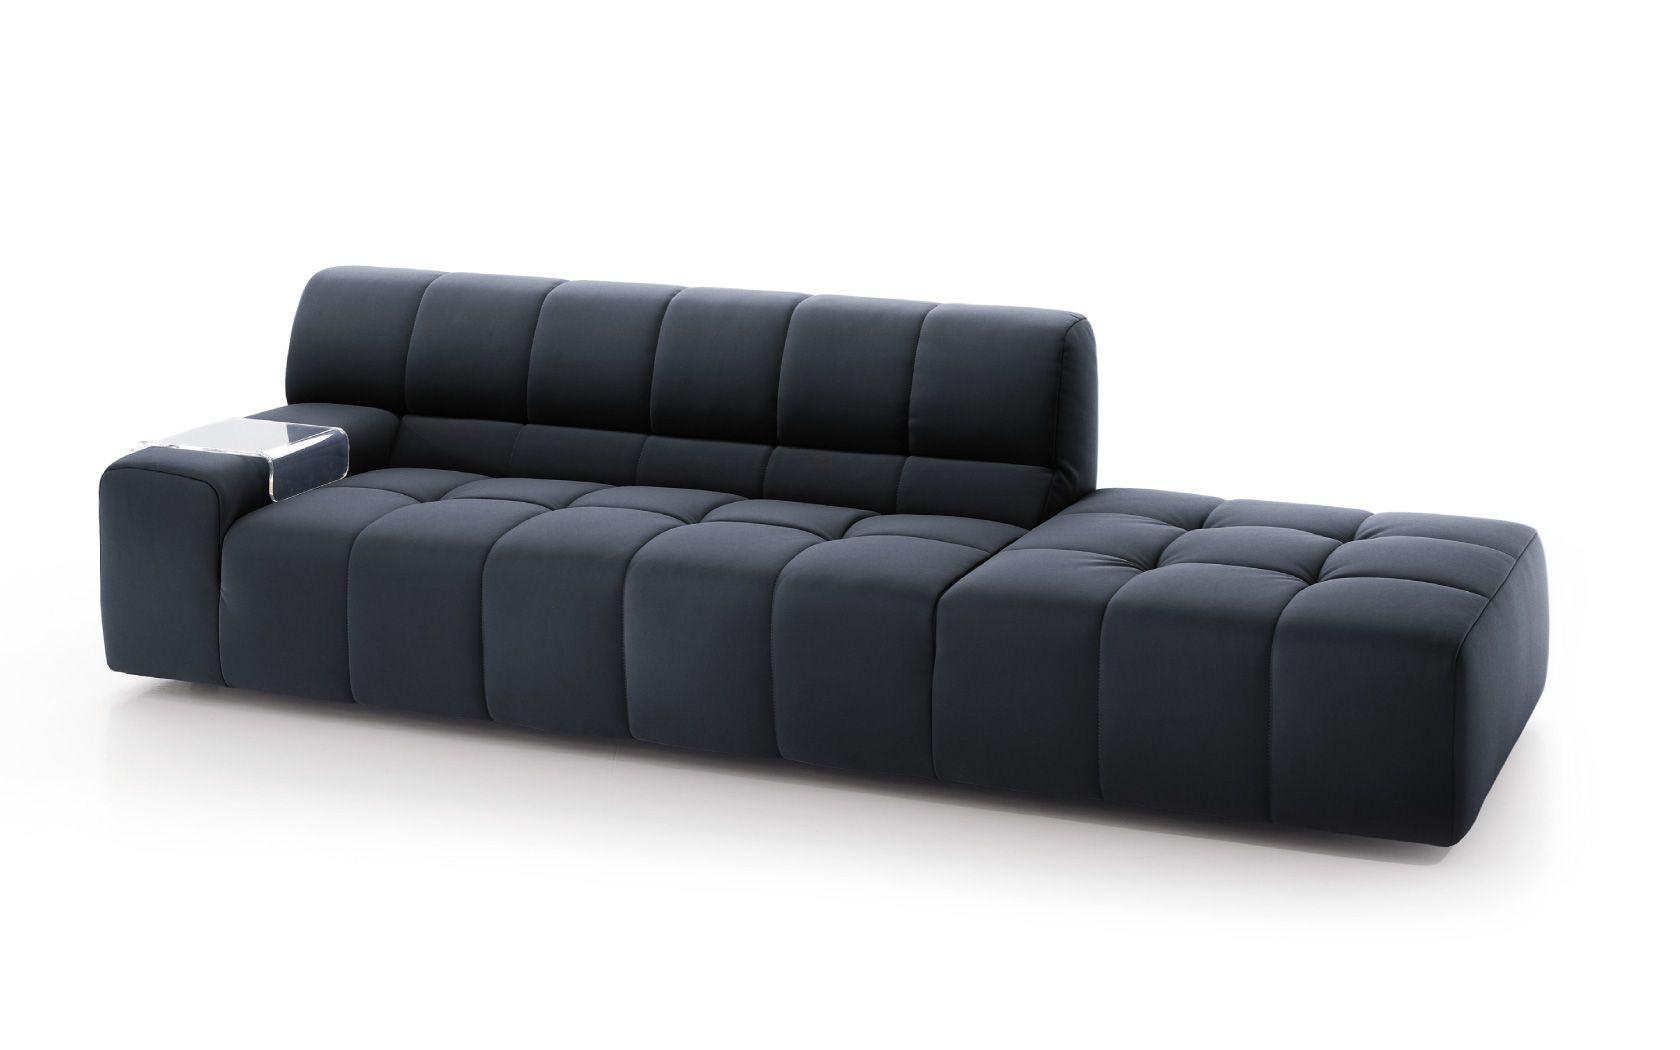 Nicoline Bric Sofa Google Search Sofa Sectional Sofa Furniture